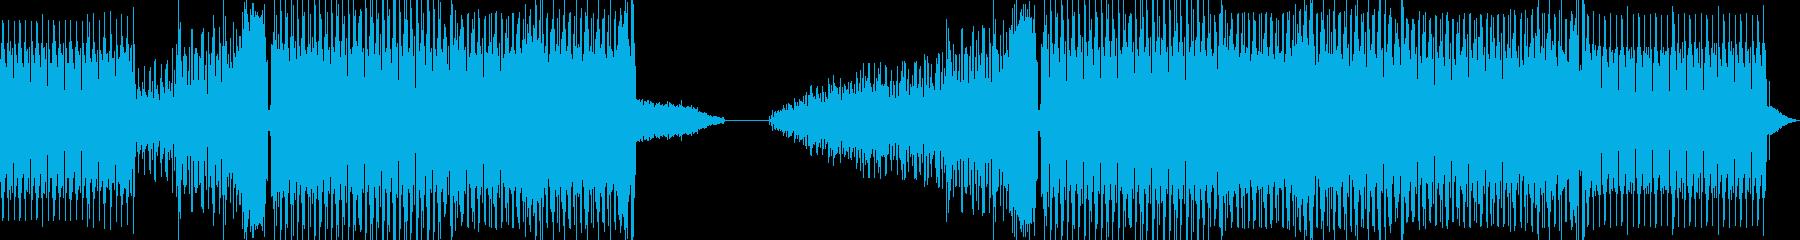 80'sダンスハウスディープハウスの再生済みの波形